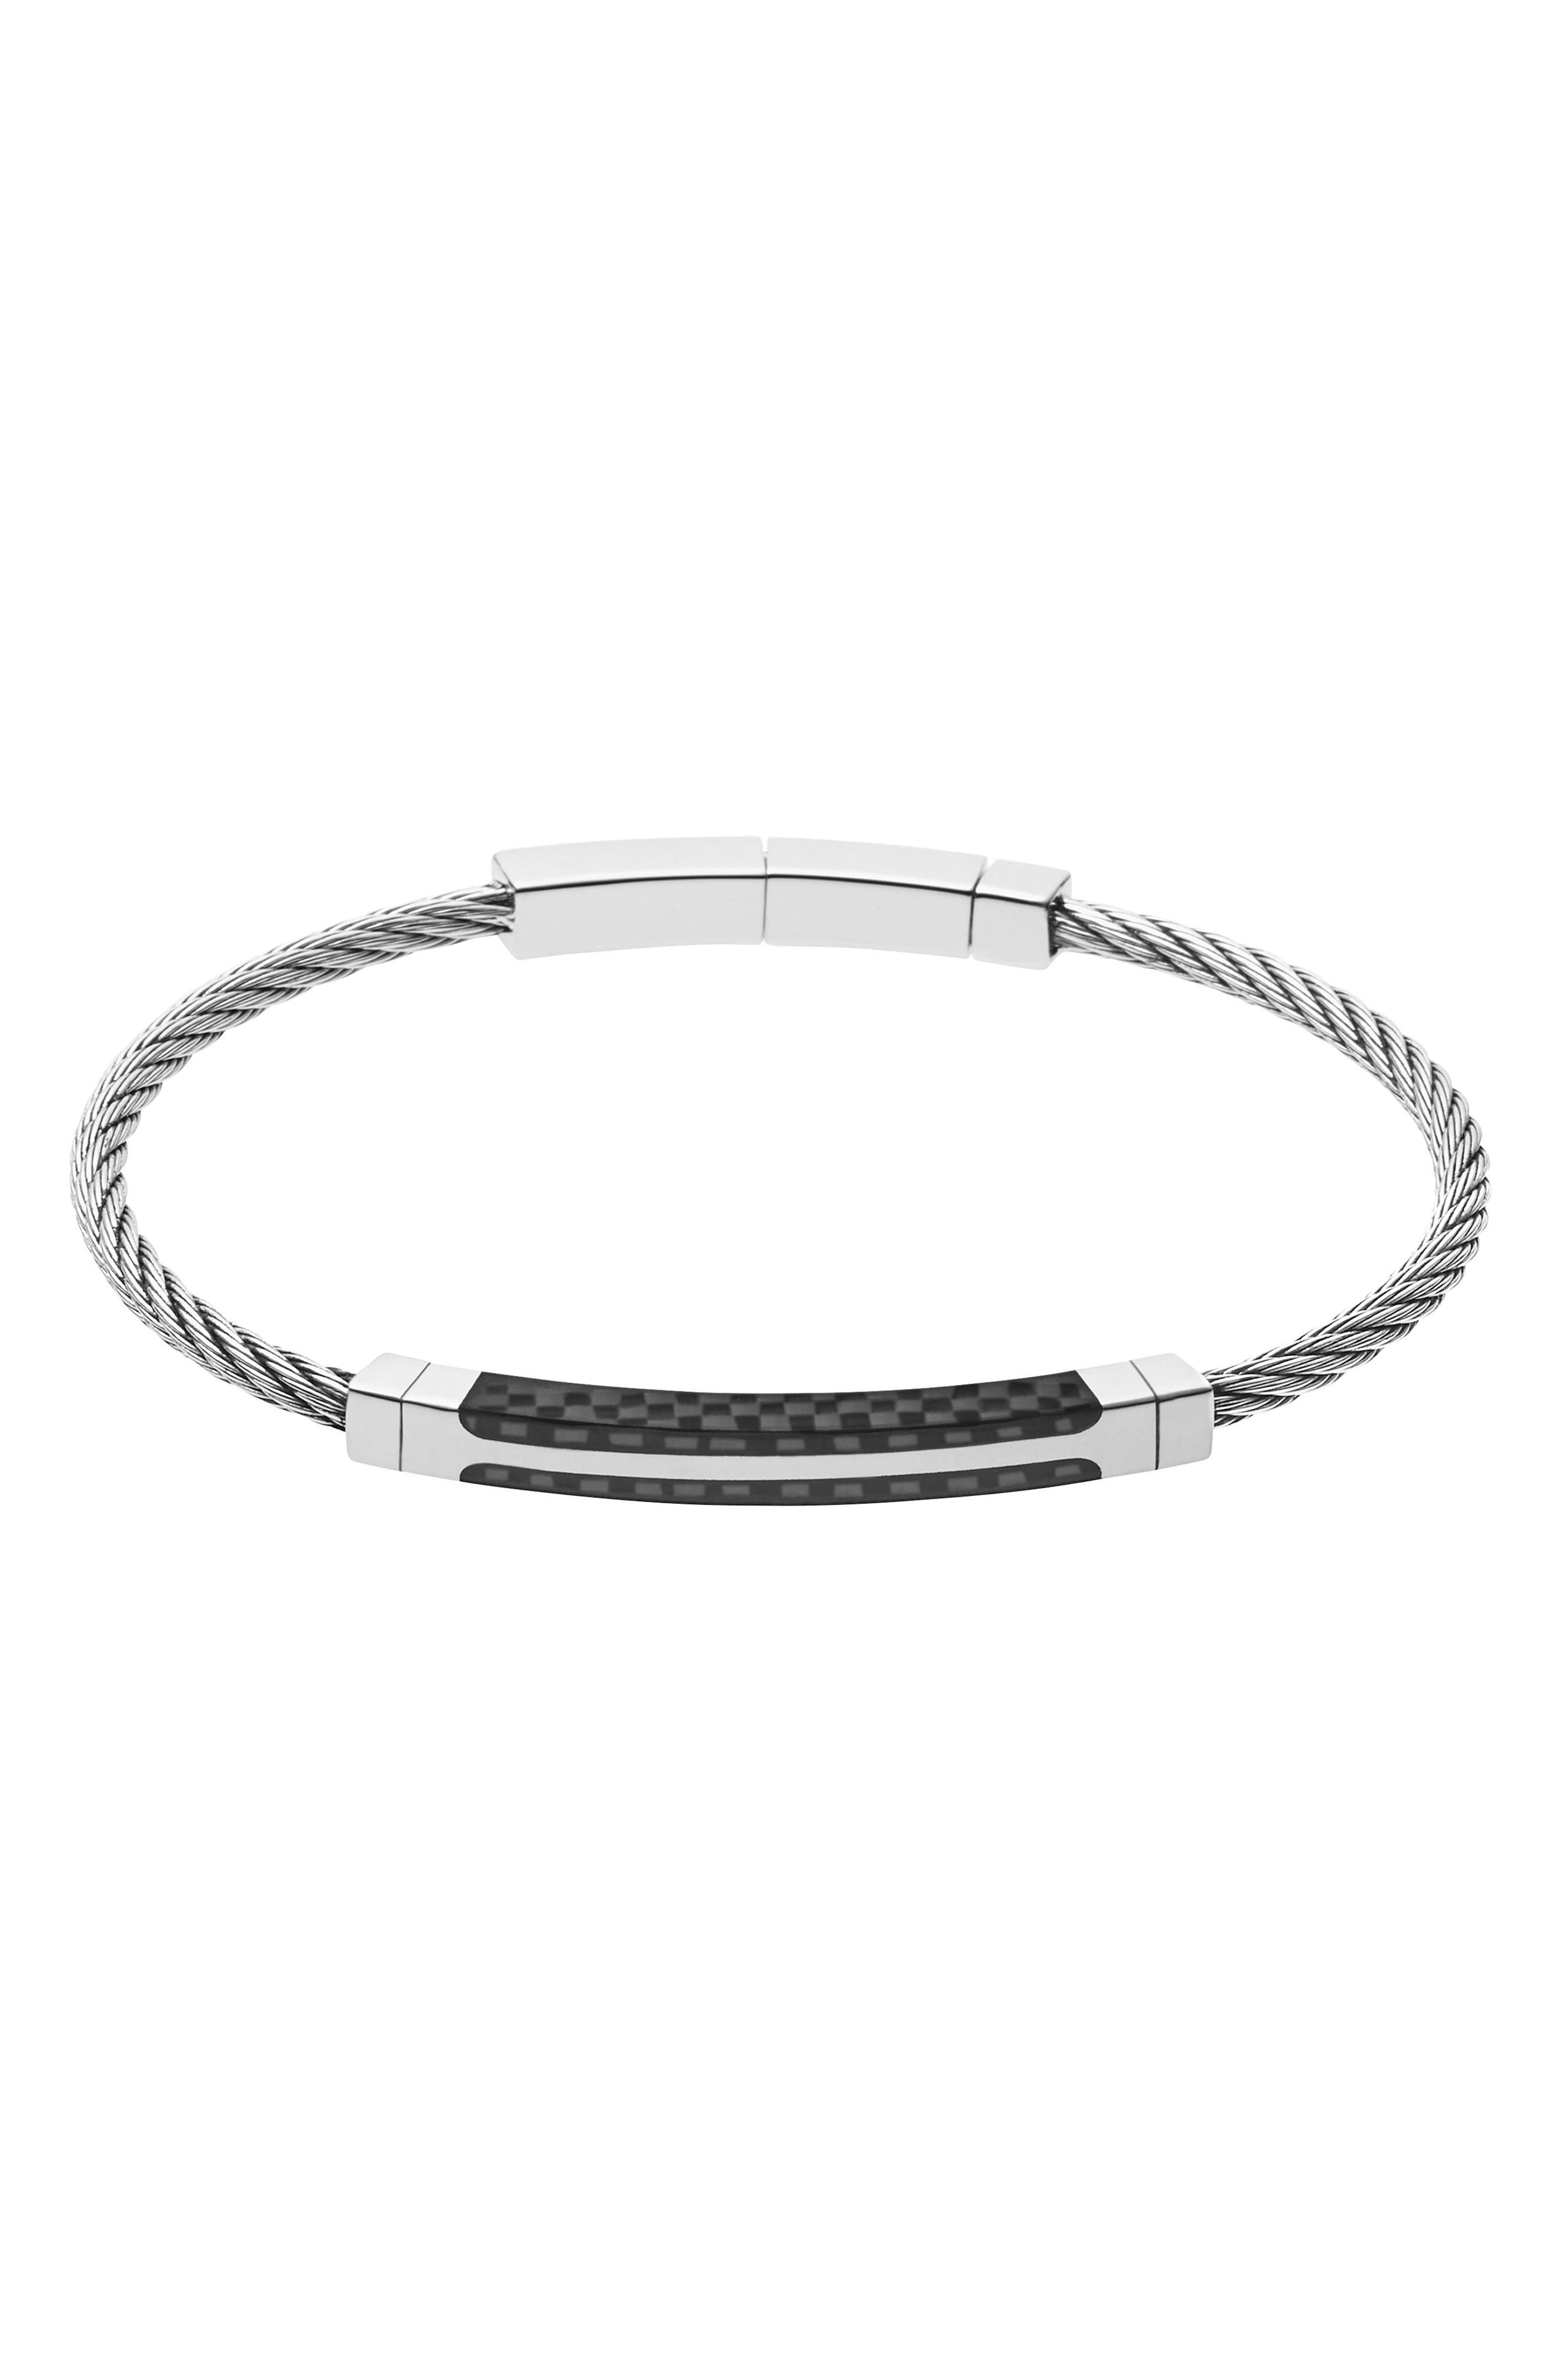 Skagen Olaf Stainless Steel & Carbon Bracelet